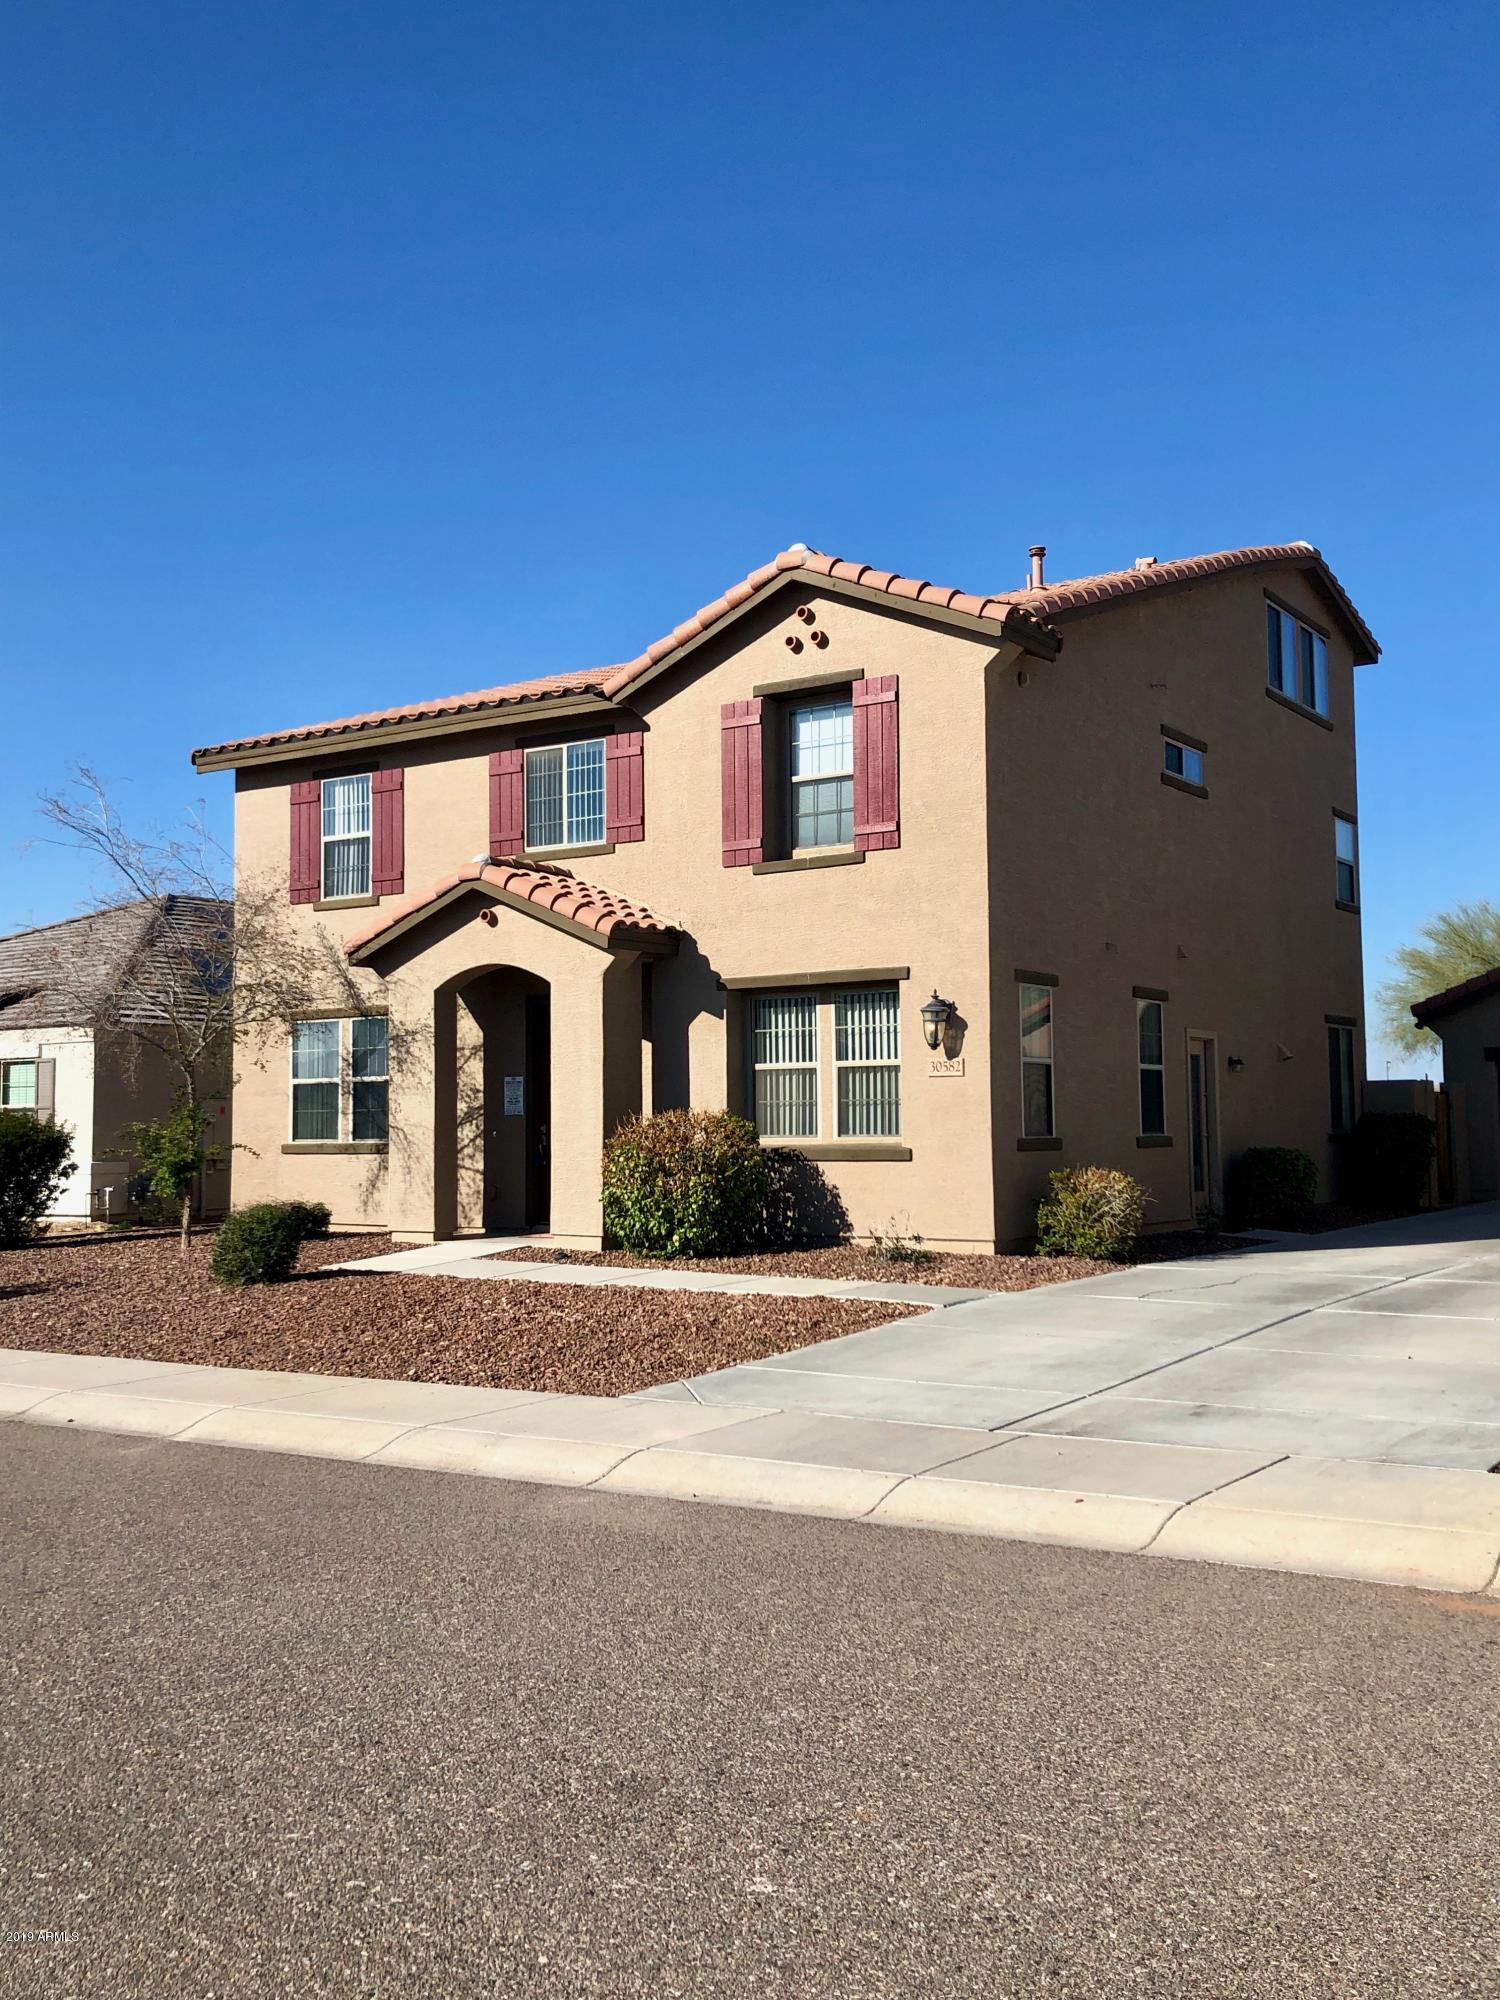 30582 W Whitton Avenue, Buckeye, AZ 85396 (MLS# 5890056